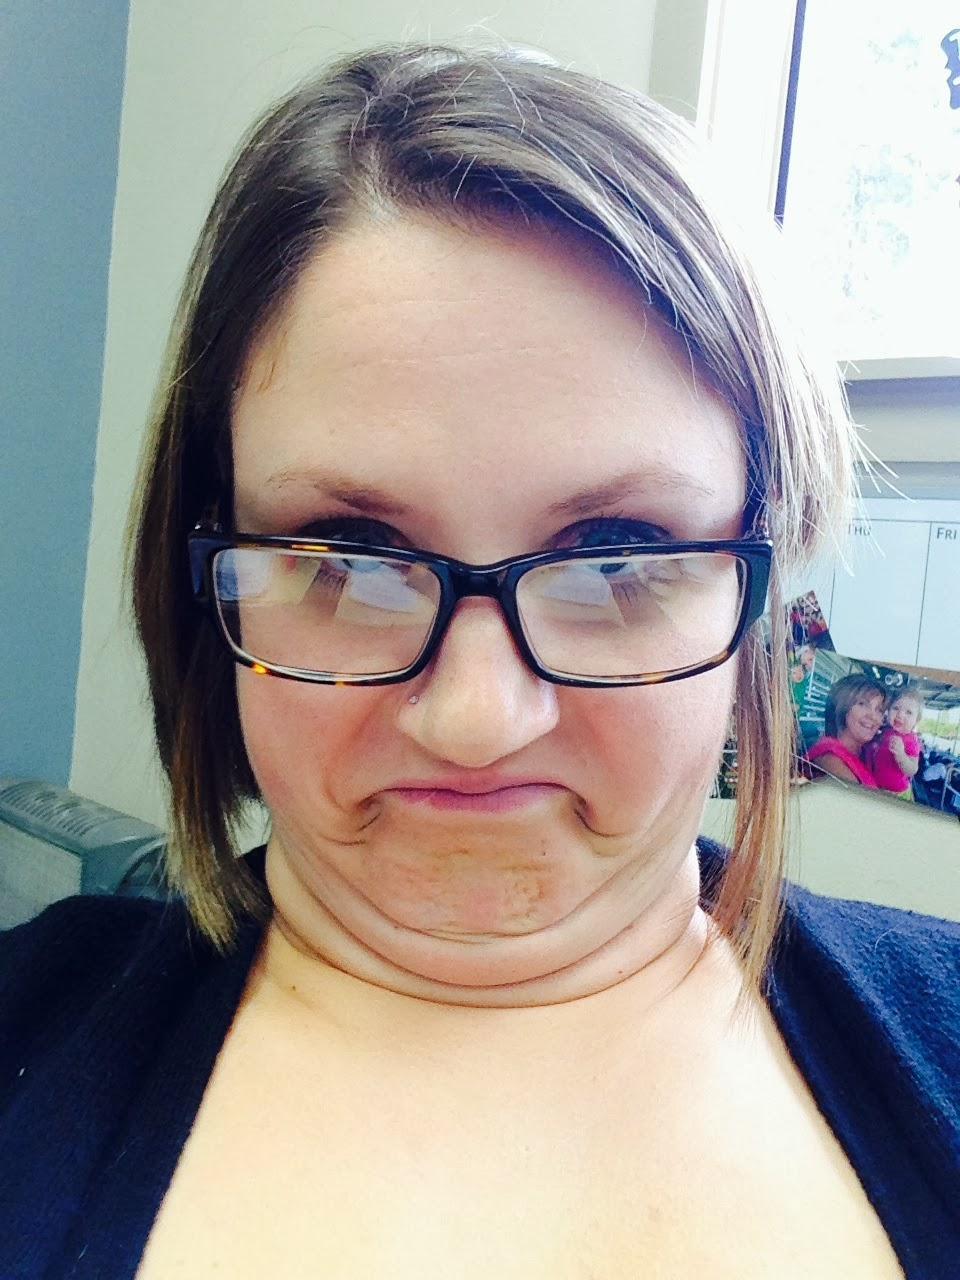 ugly fat selfie - photo #2